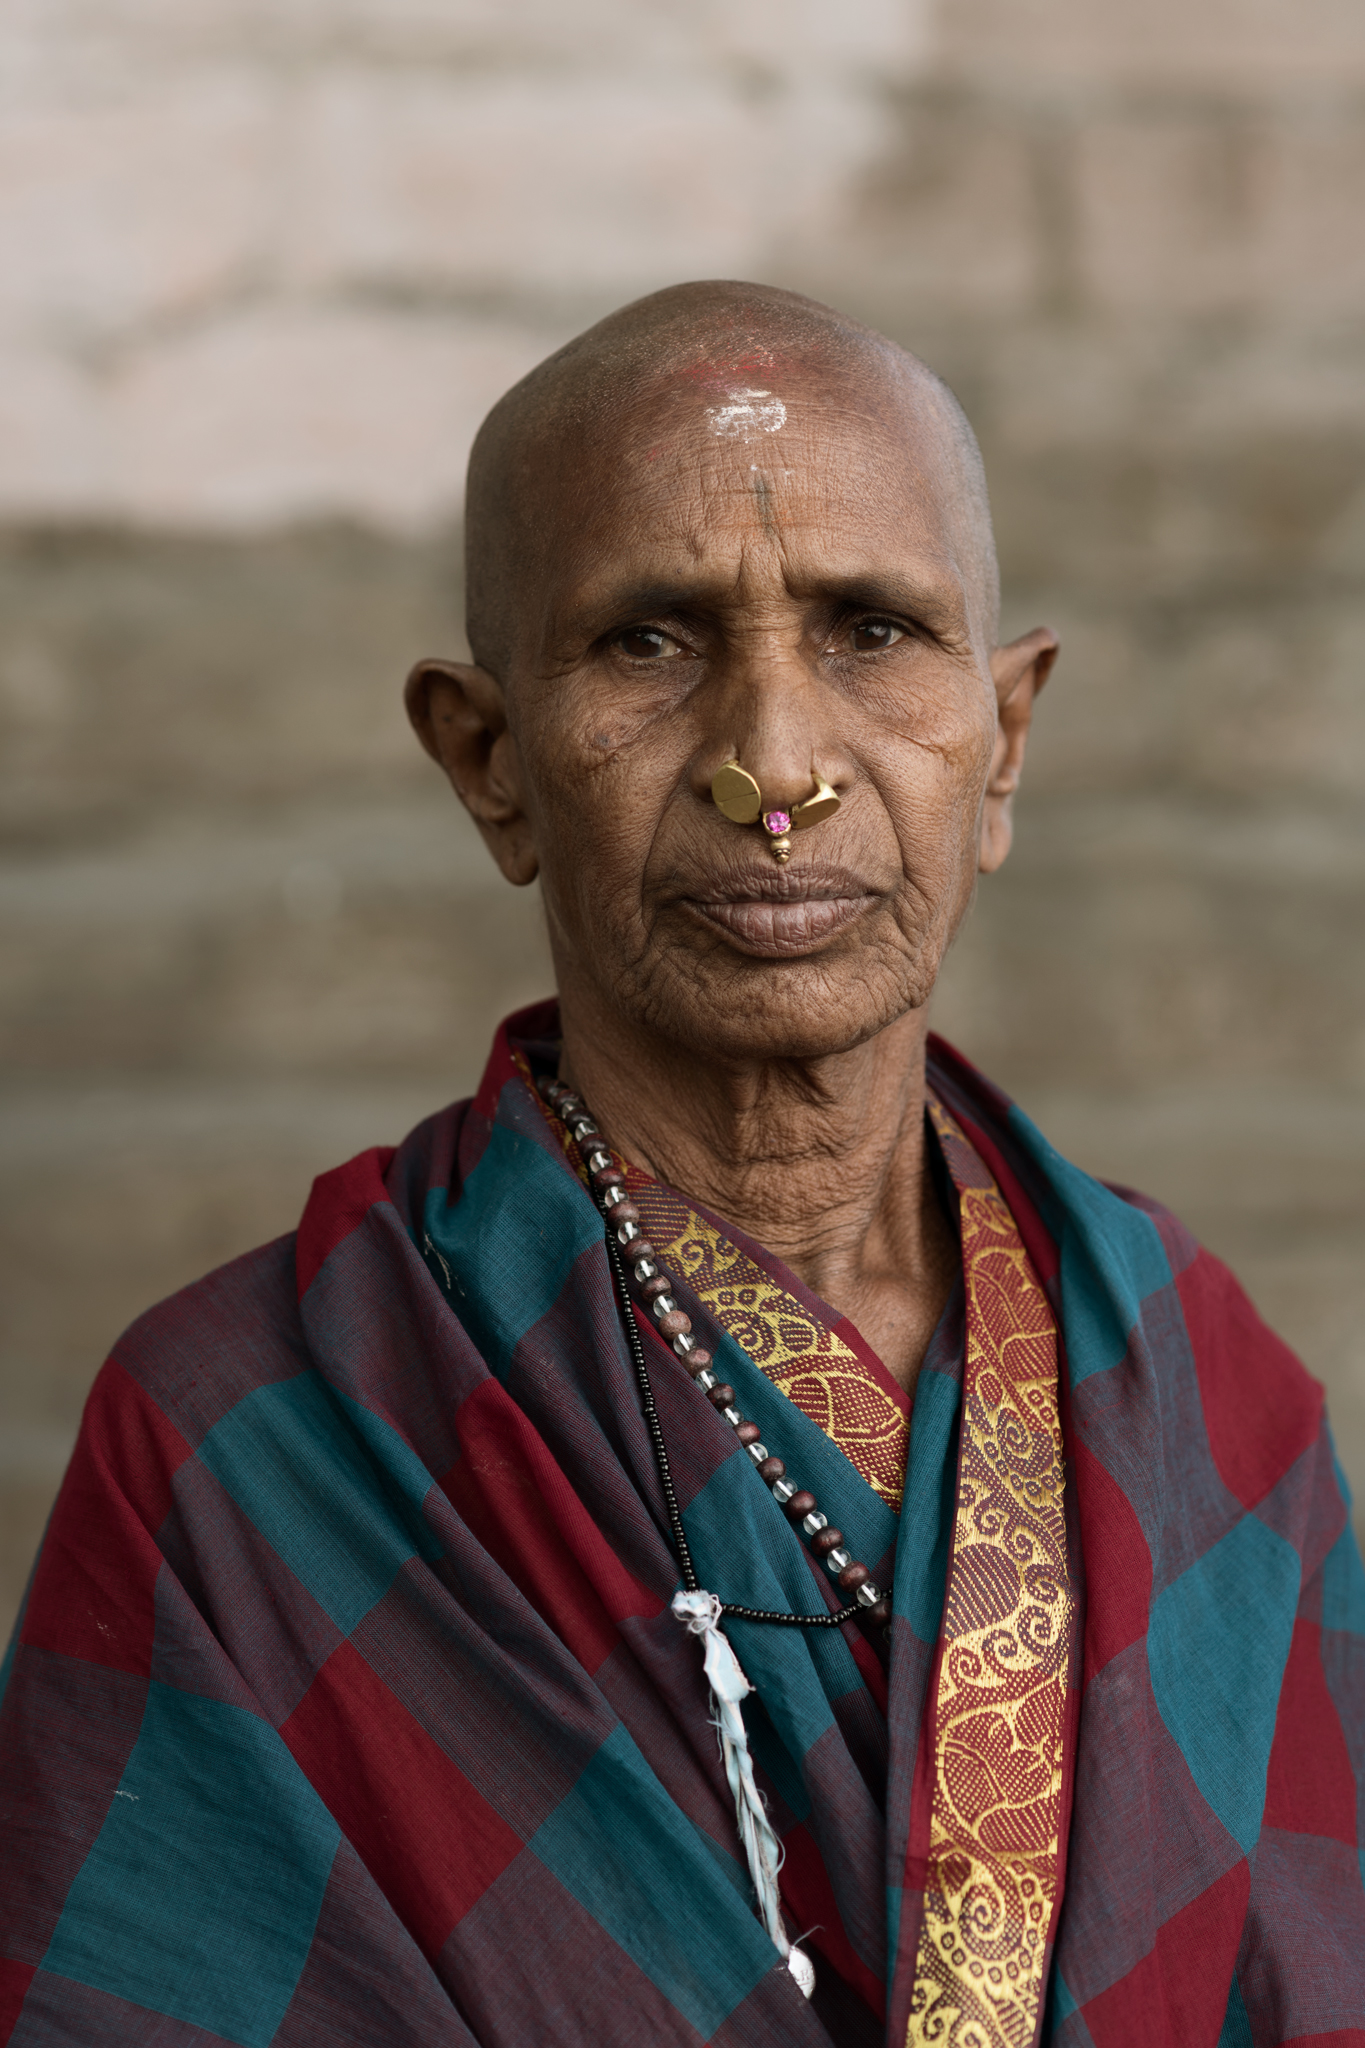 Varanasi_portrait_travel_photography_Manchester_Adventure_Photographer_Jan_Bella2.jpg